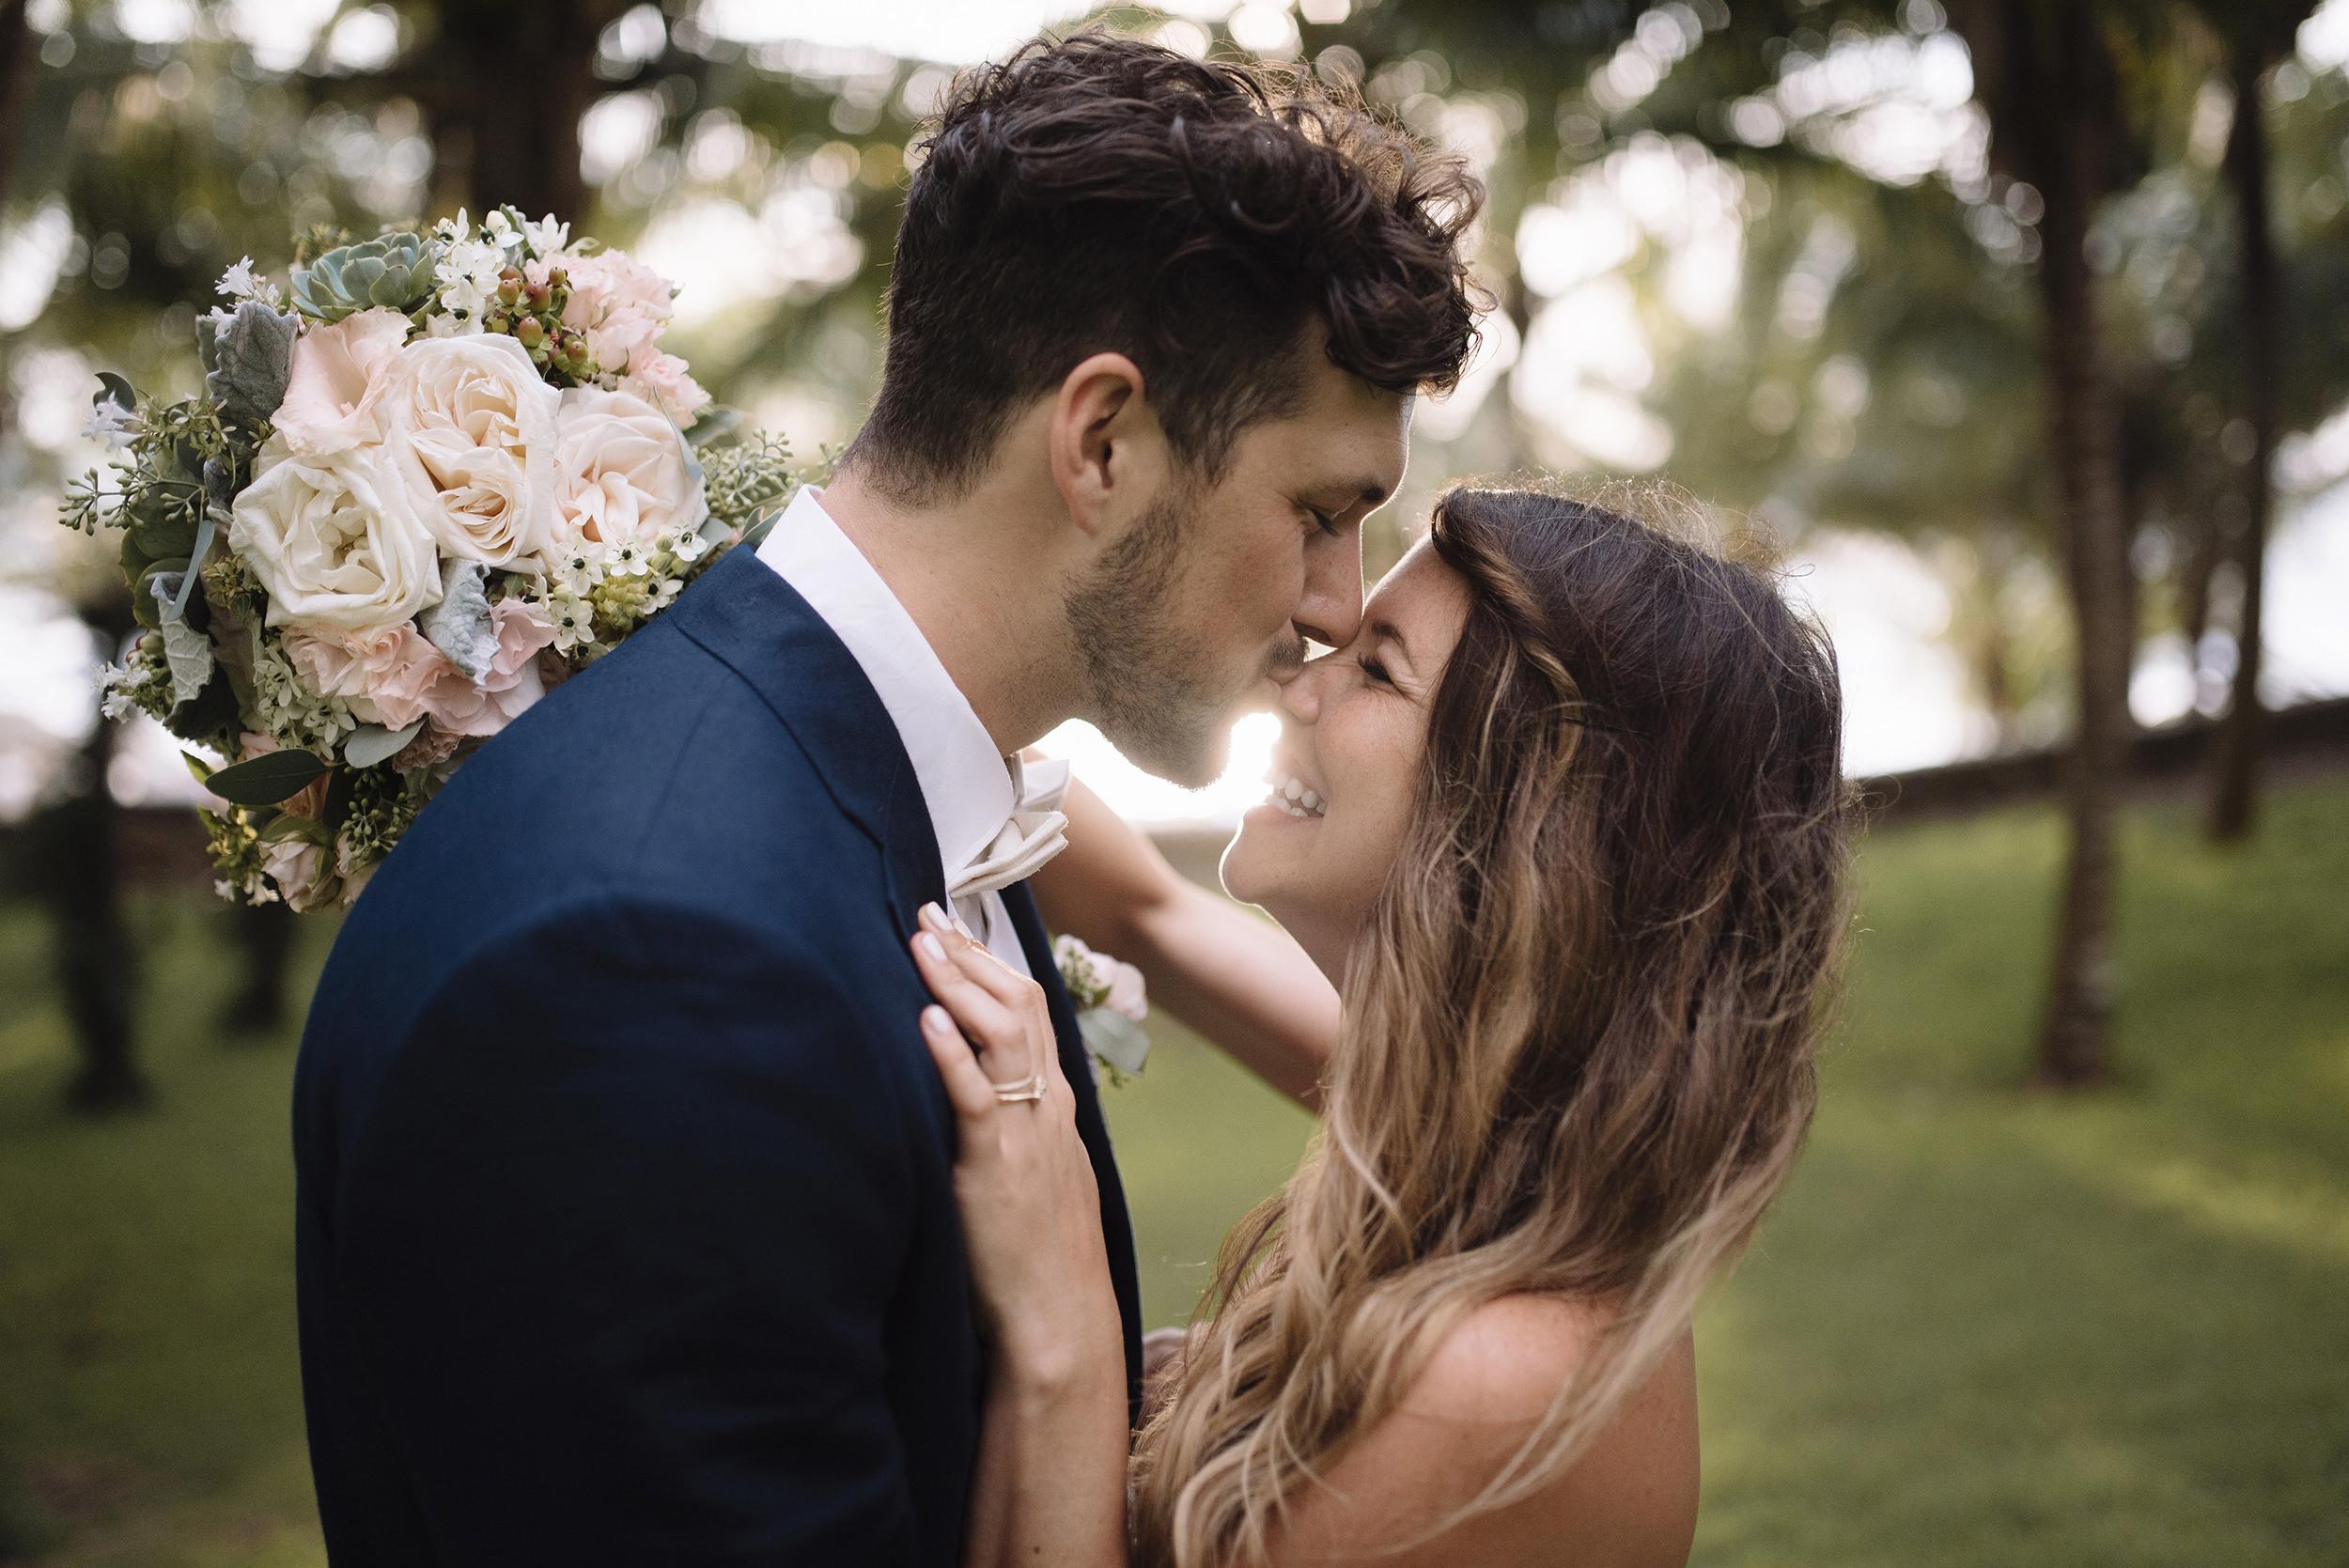 Colby-and-Jess-Intimate-Destination-Wedding-Sayulita-Puerto-Vallarta-Mexico107.jpg